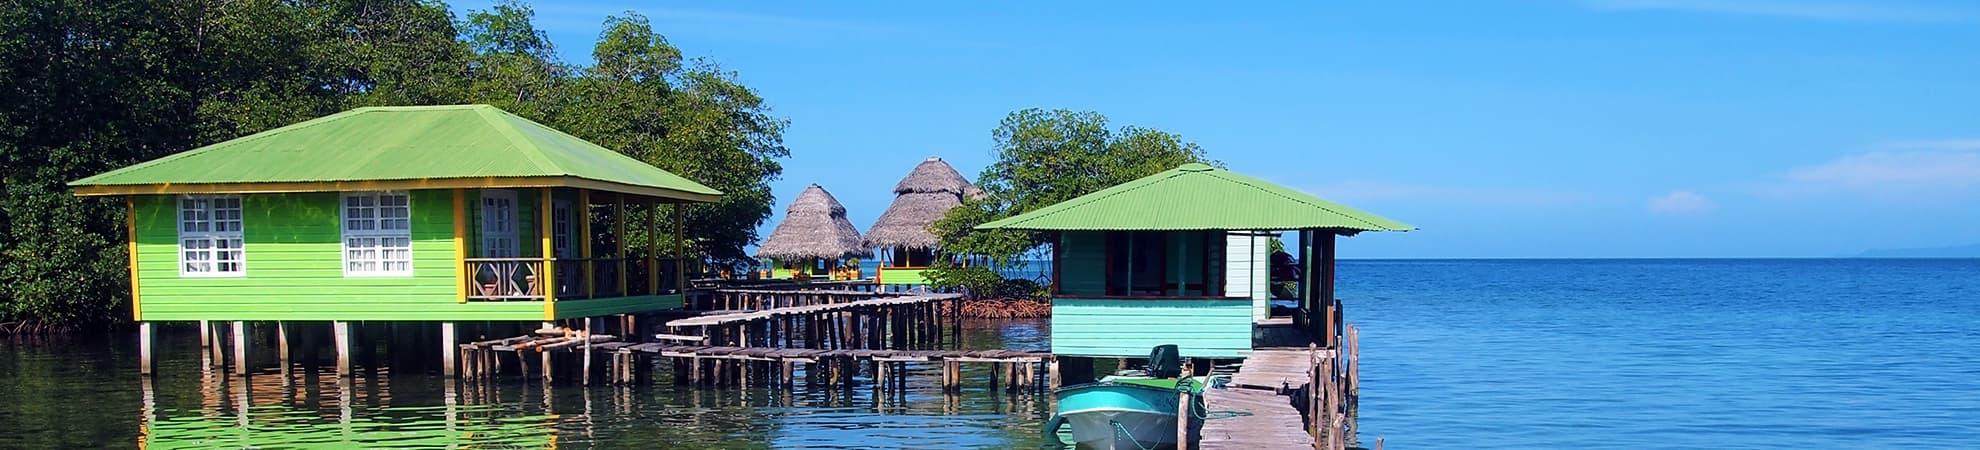 Voyage Le Panama